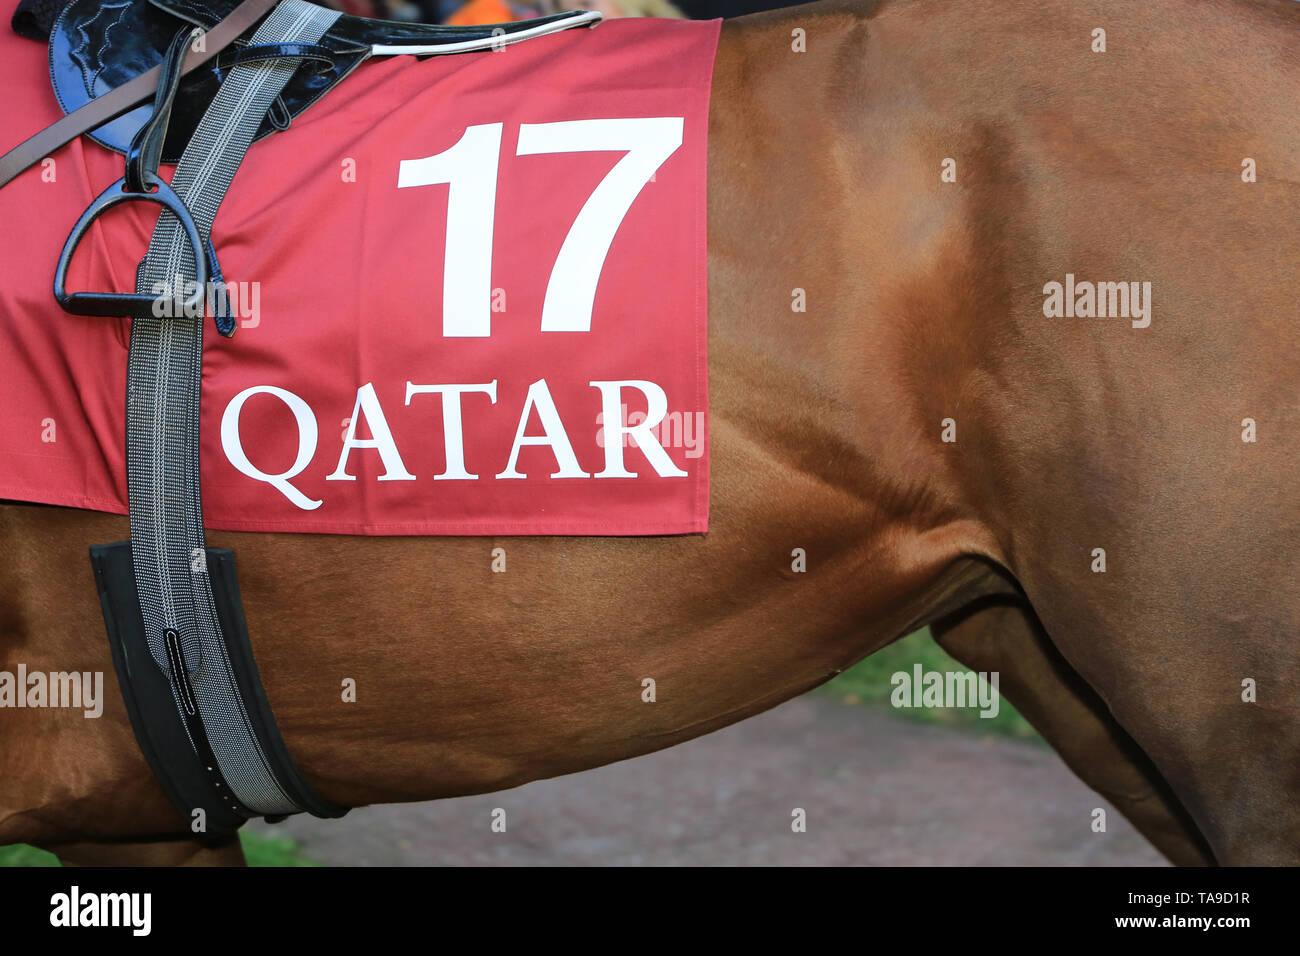 Qatar - Price Arc de Triomphe. - Stock Image